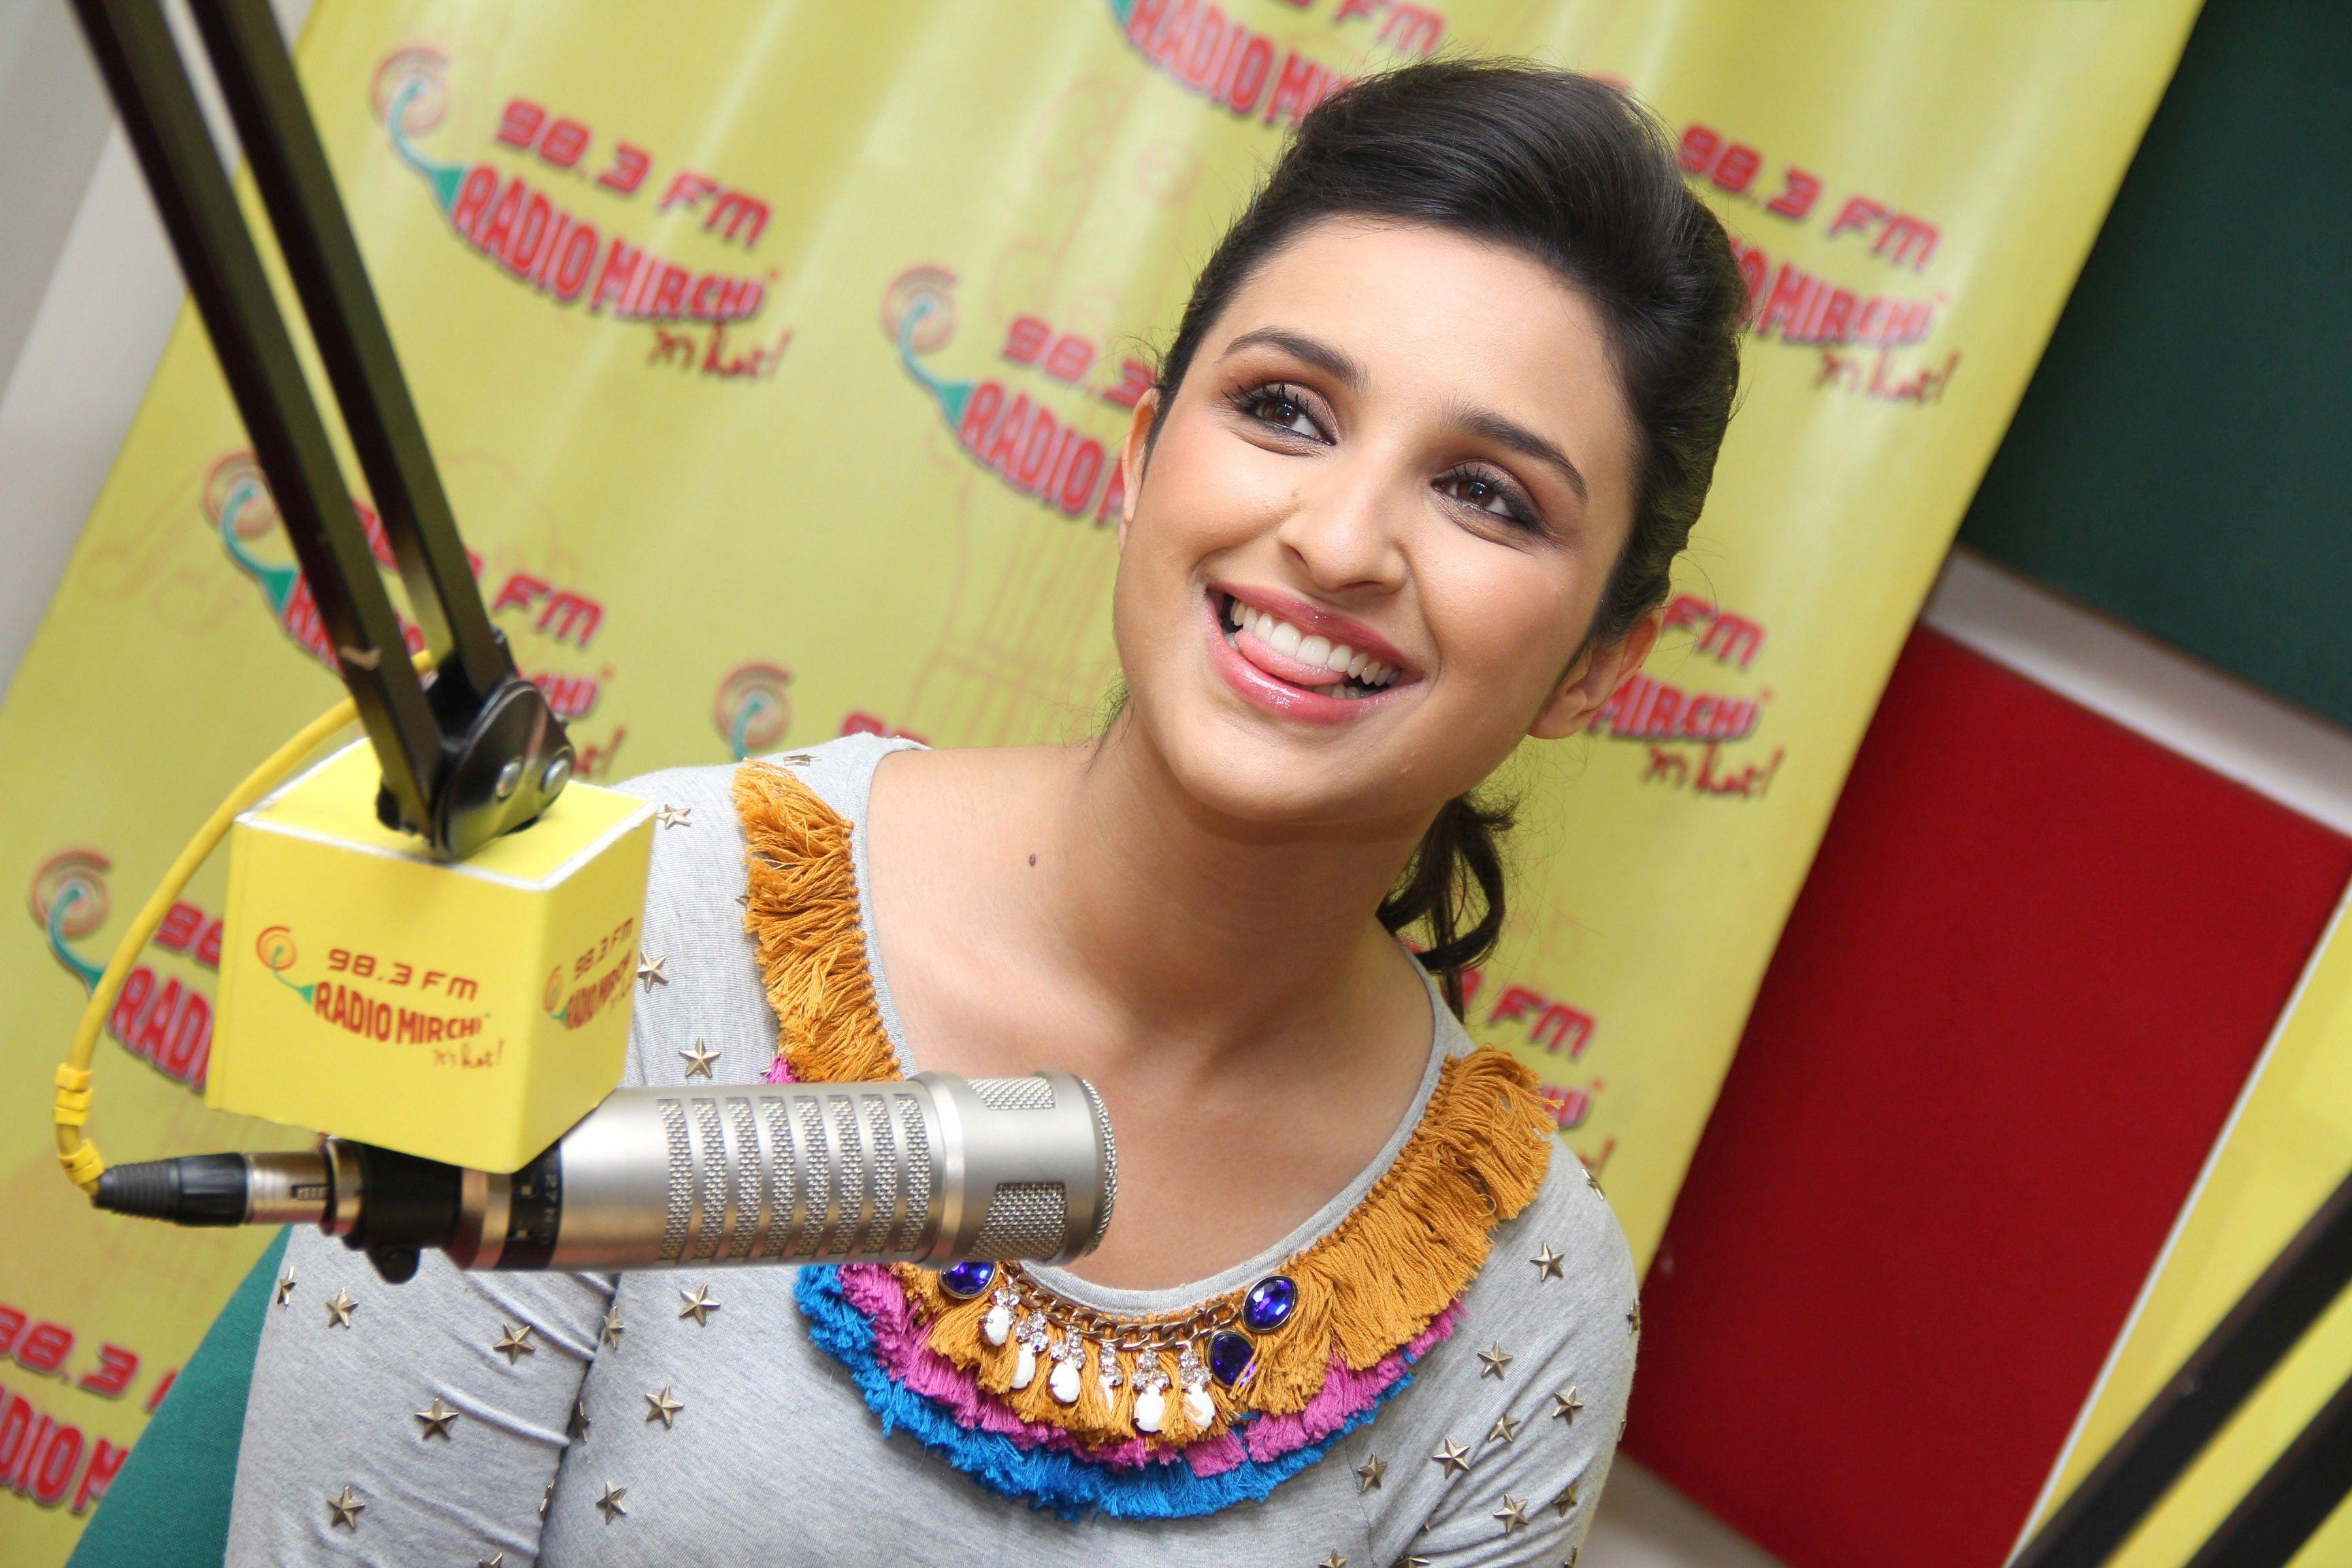 Sonakshi Sinha 2000p Photos: Famous Beautiful Actress Parineeti Chopra At Radio Mirchi